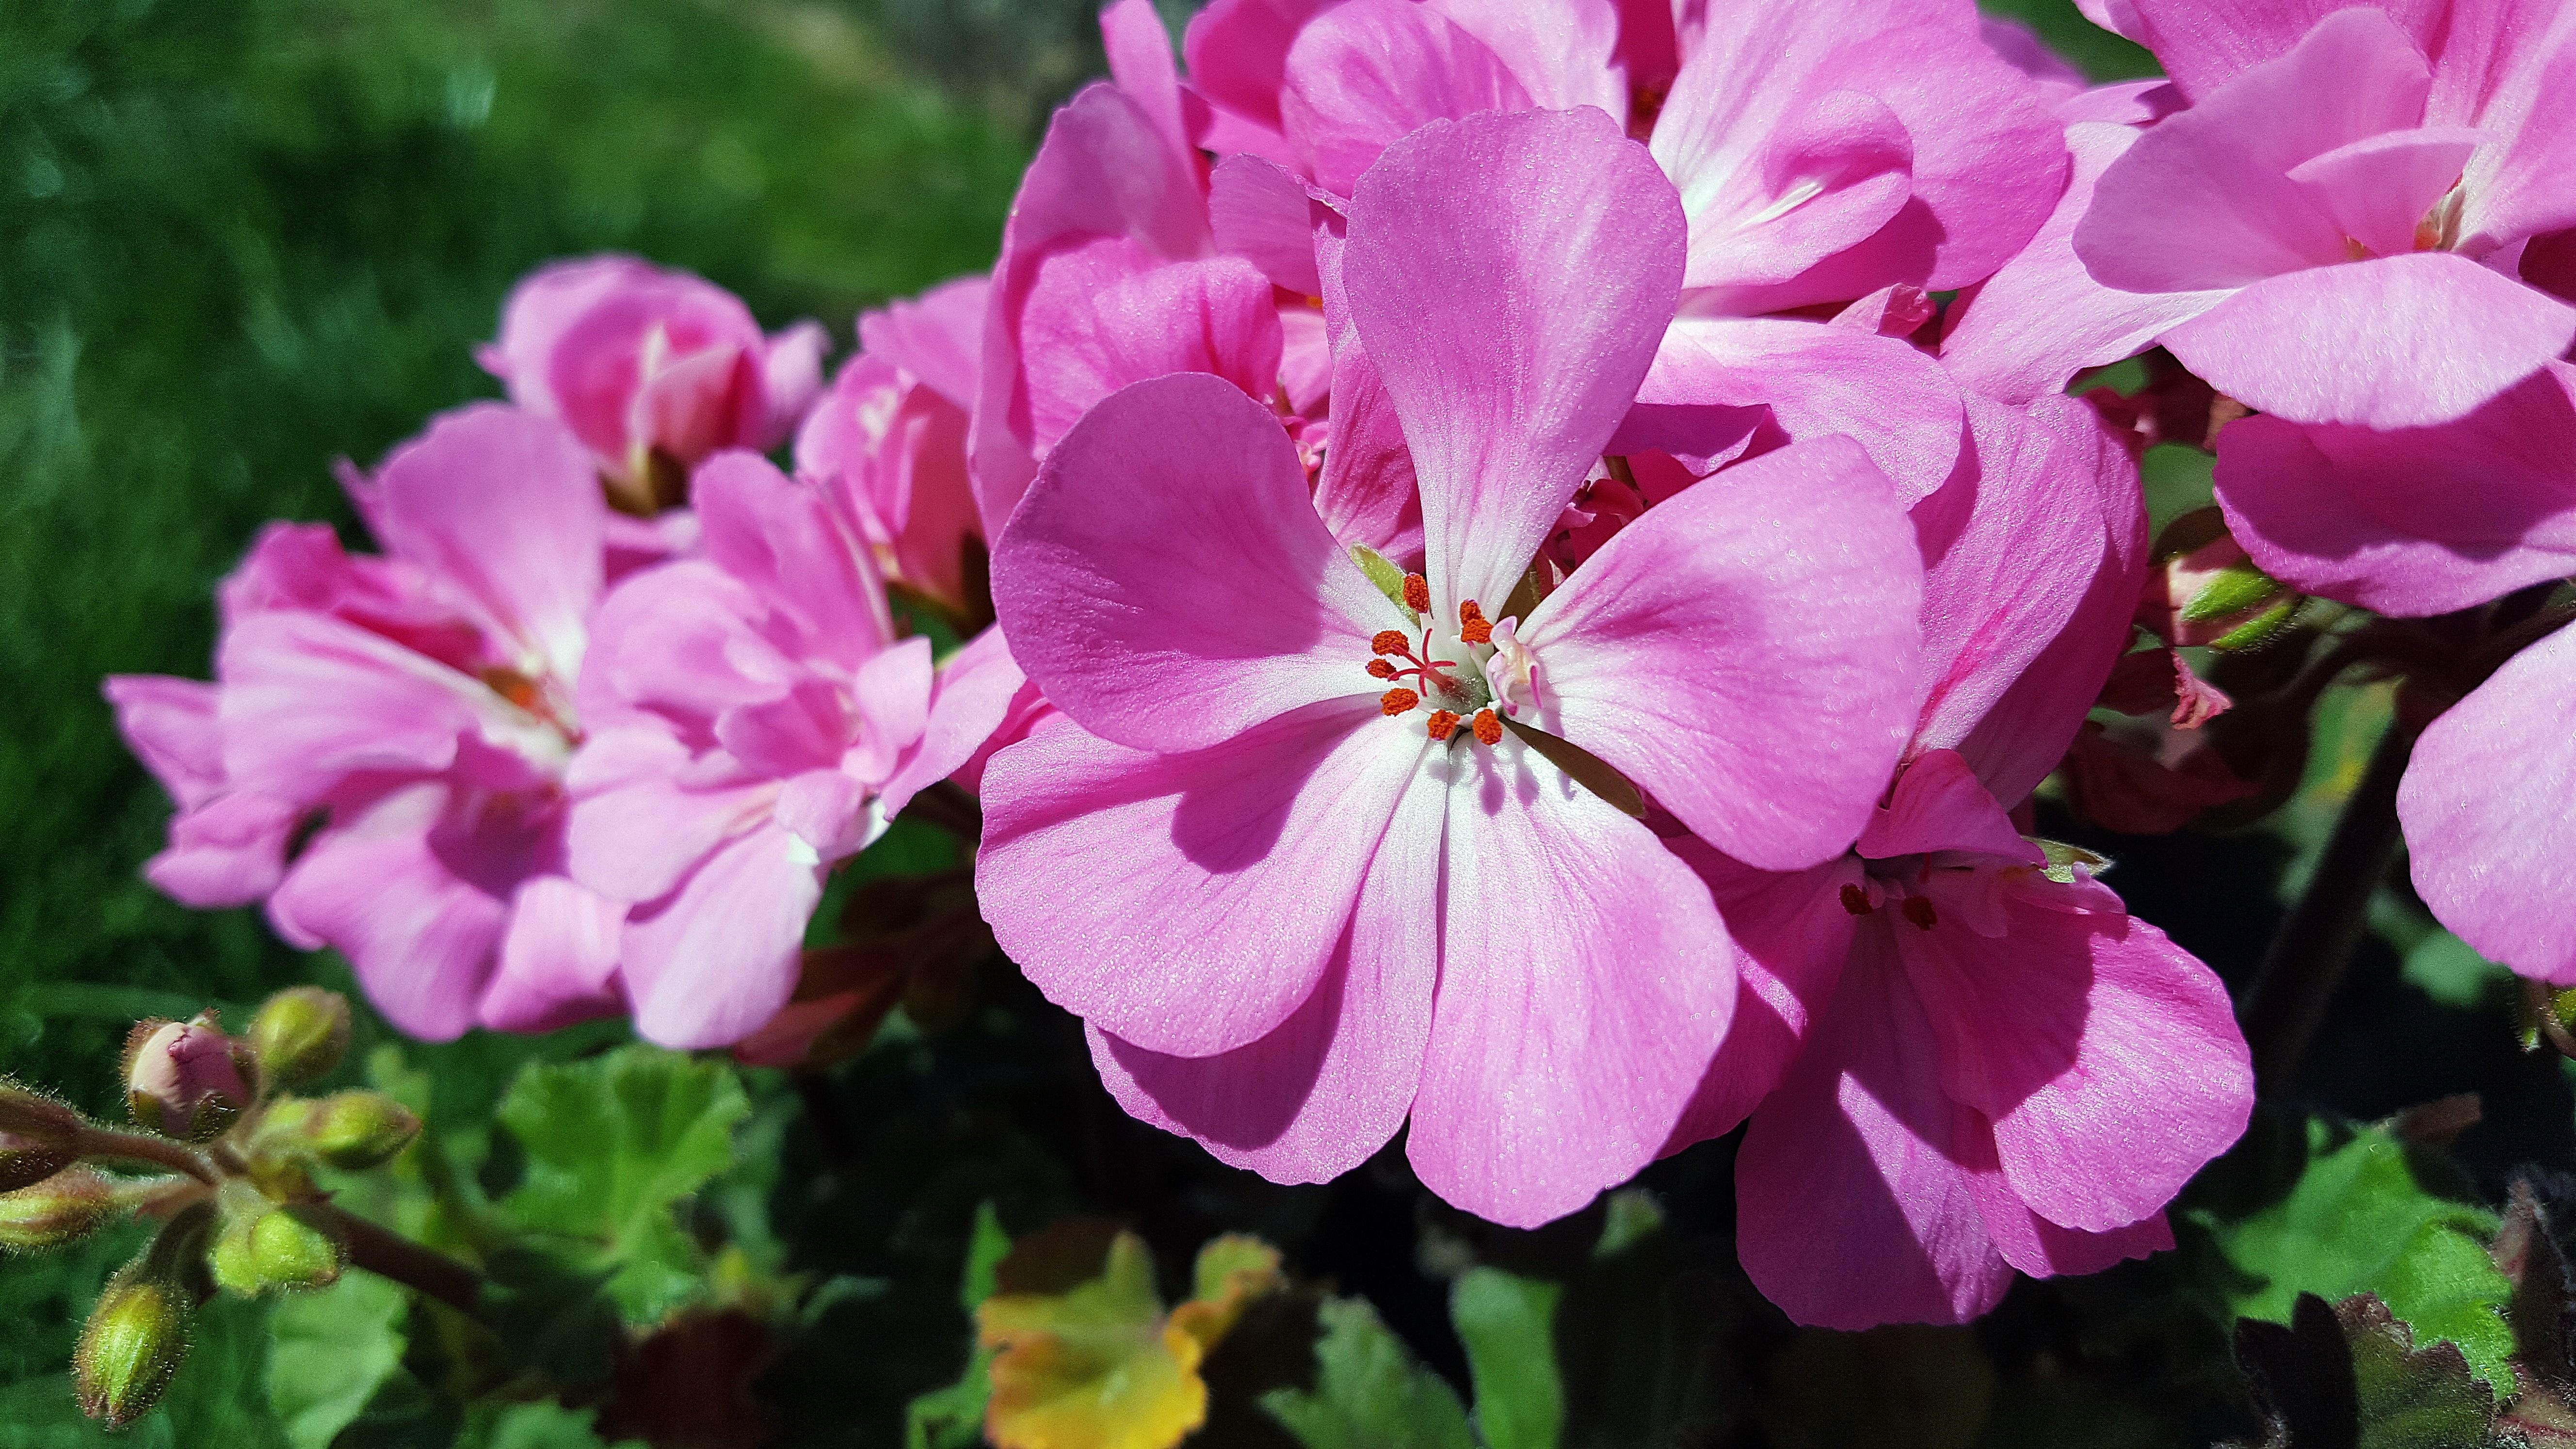 Gambar : alam, mekar, menanam, daun bunga, berkembang, botani, berwarna merah muda, Flora, abadi, bunga liar, bunga-bunga, kerenyam, belukar, musim semi, ...